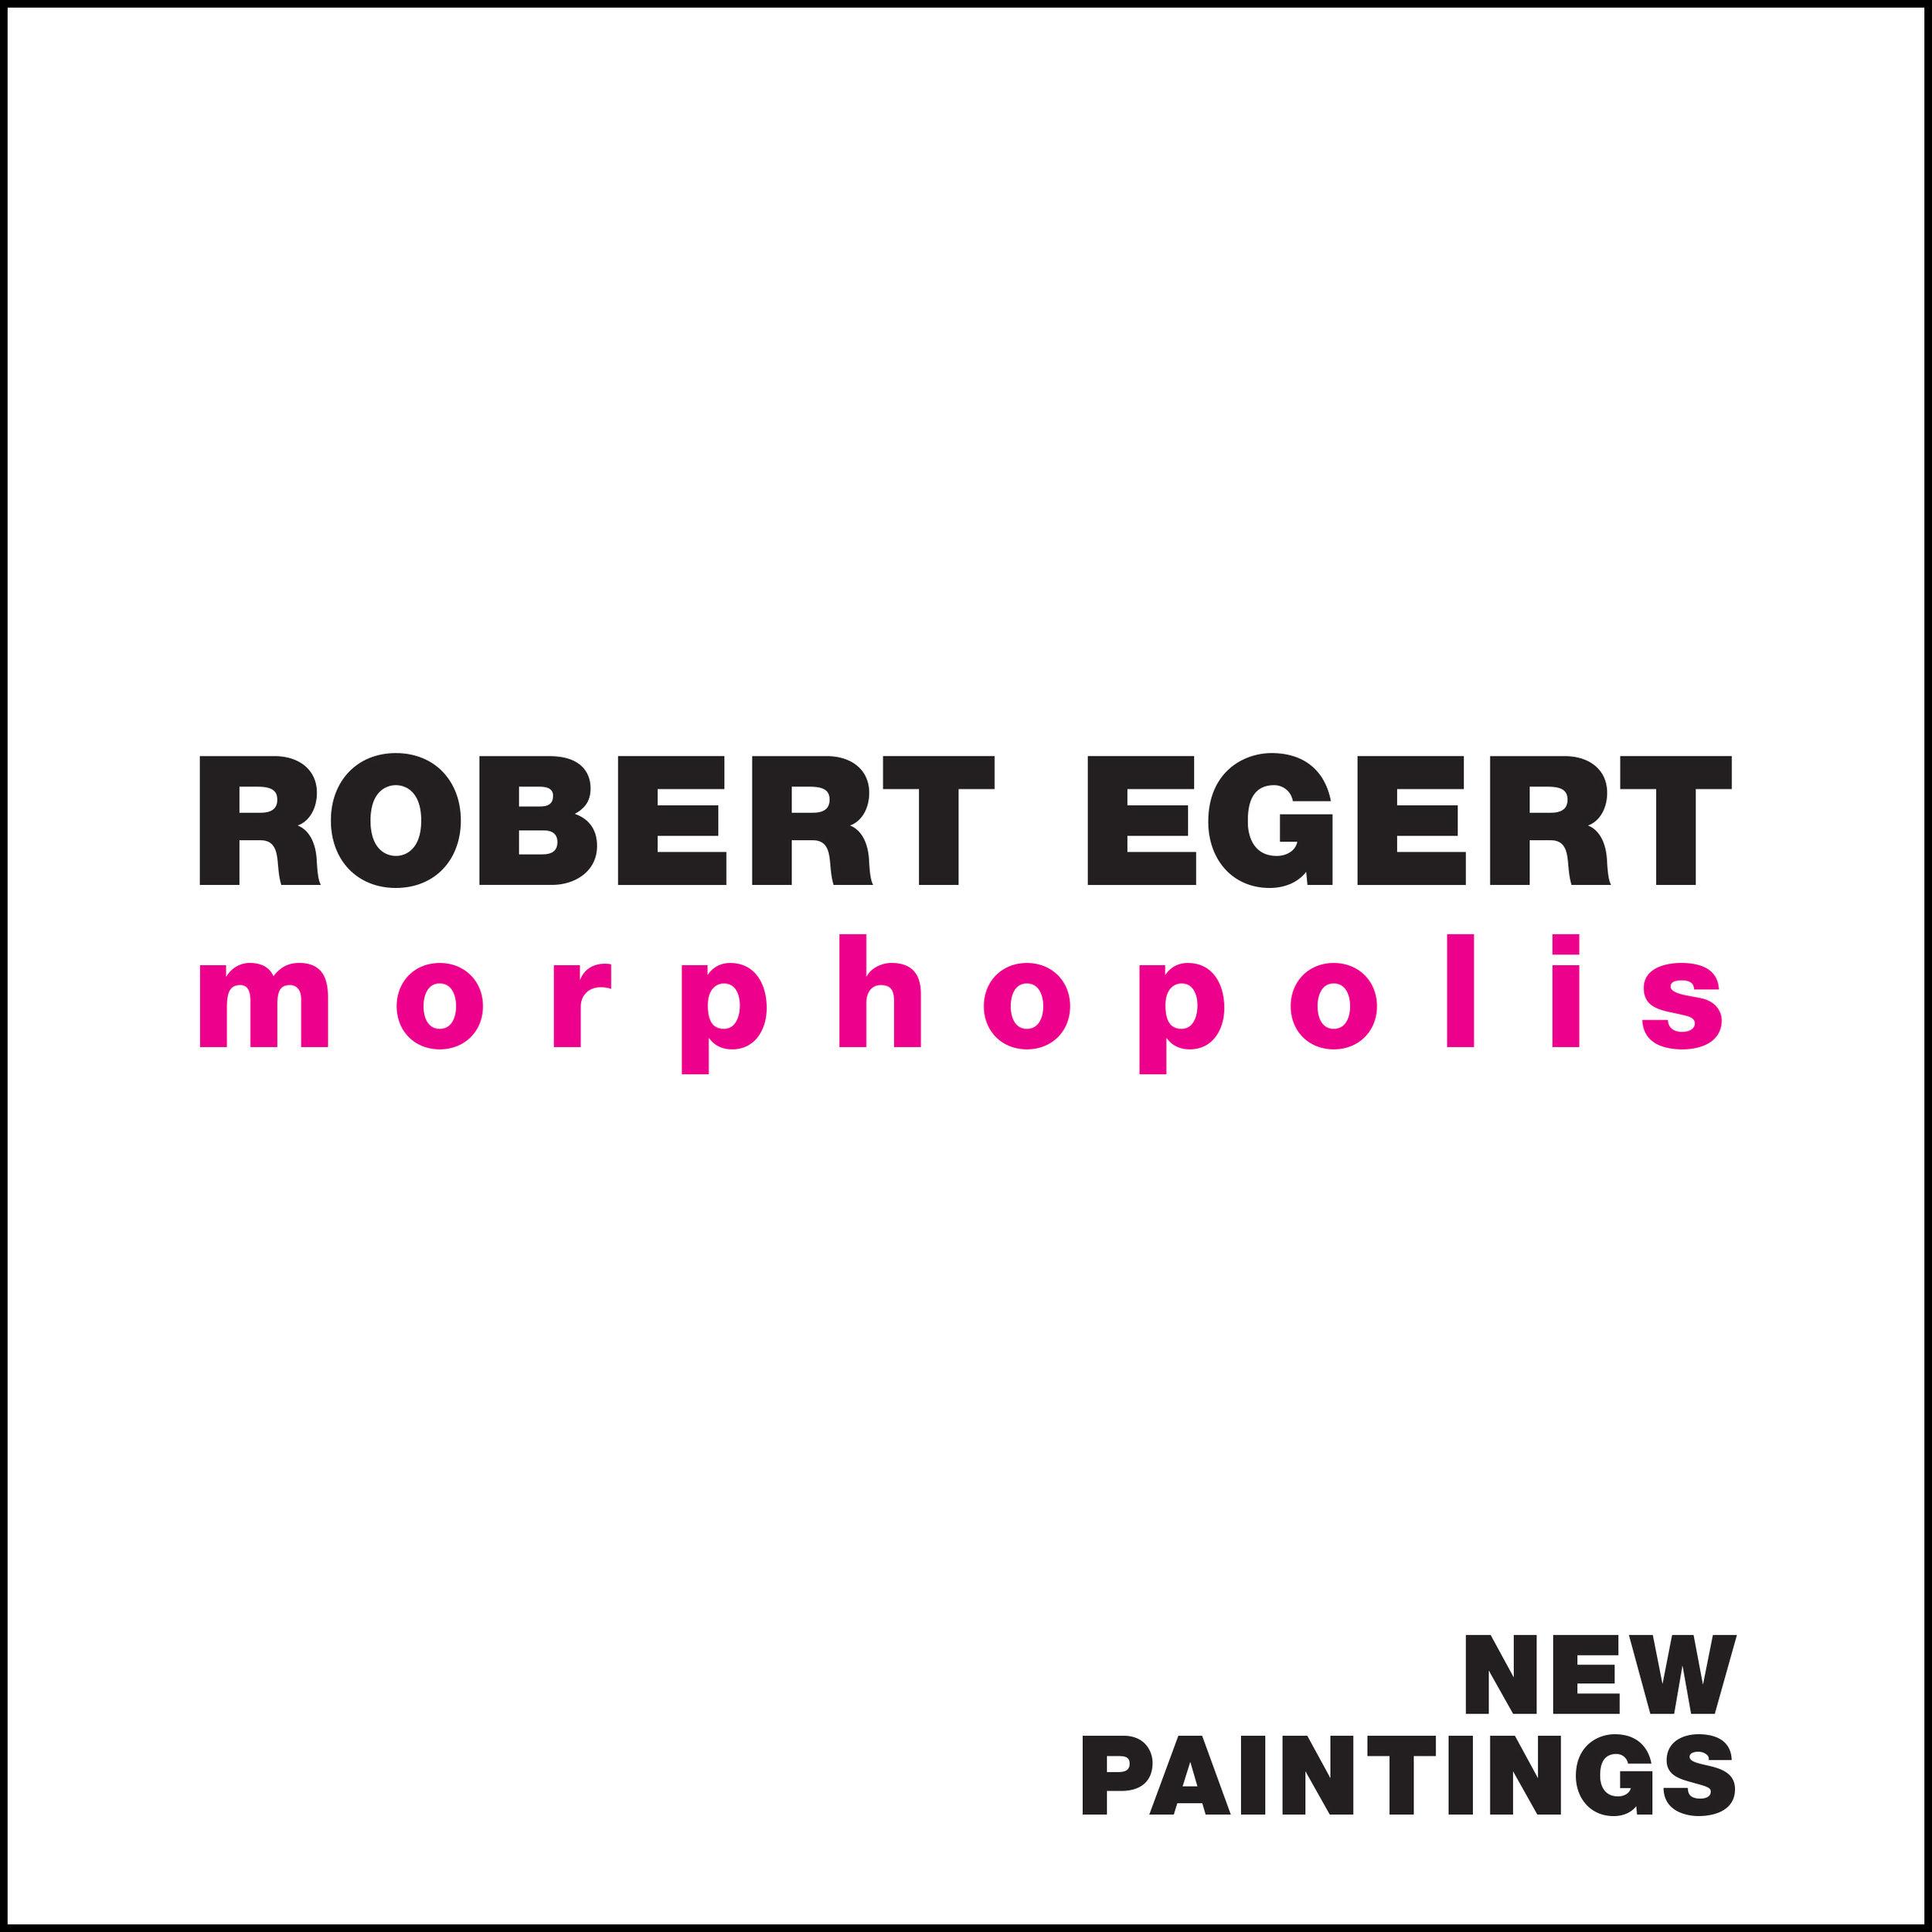 RobertEgertCatalogue_COVER.jpg